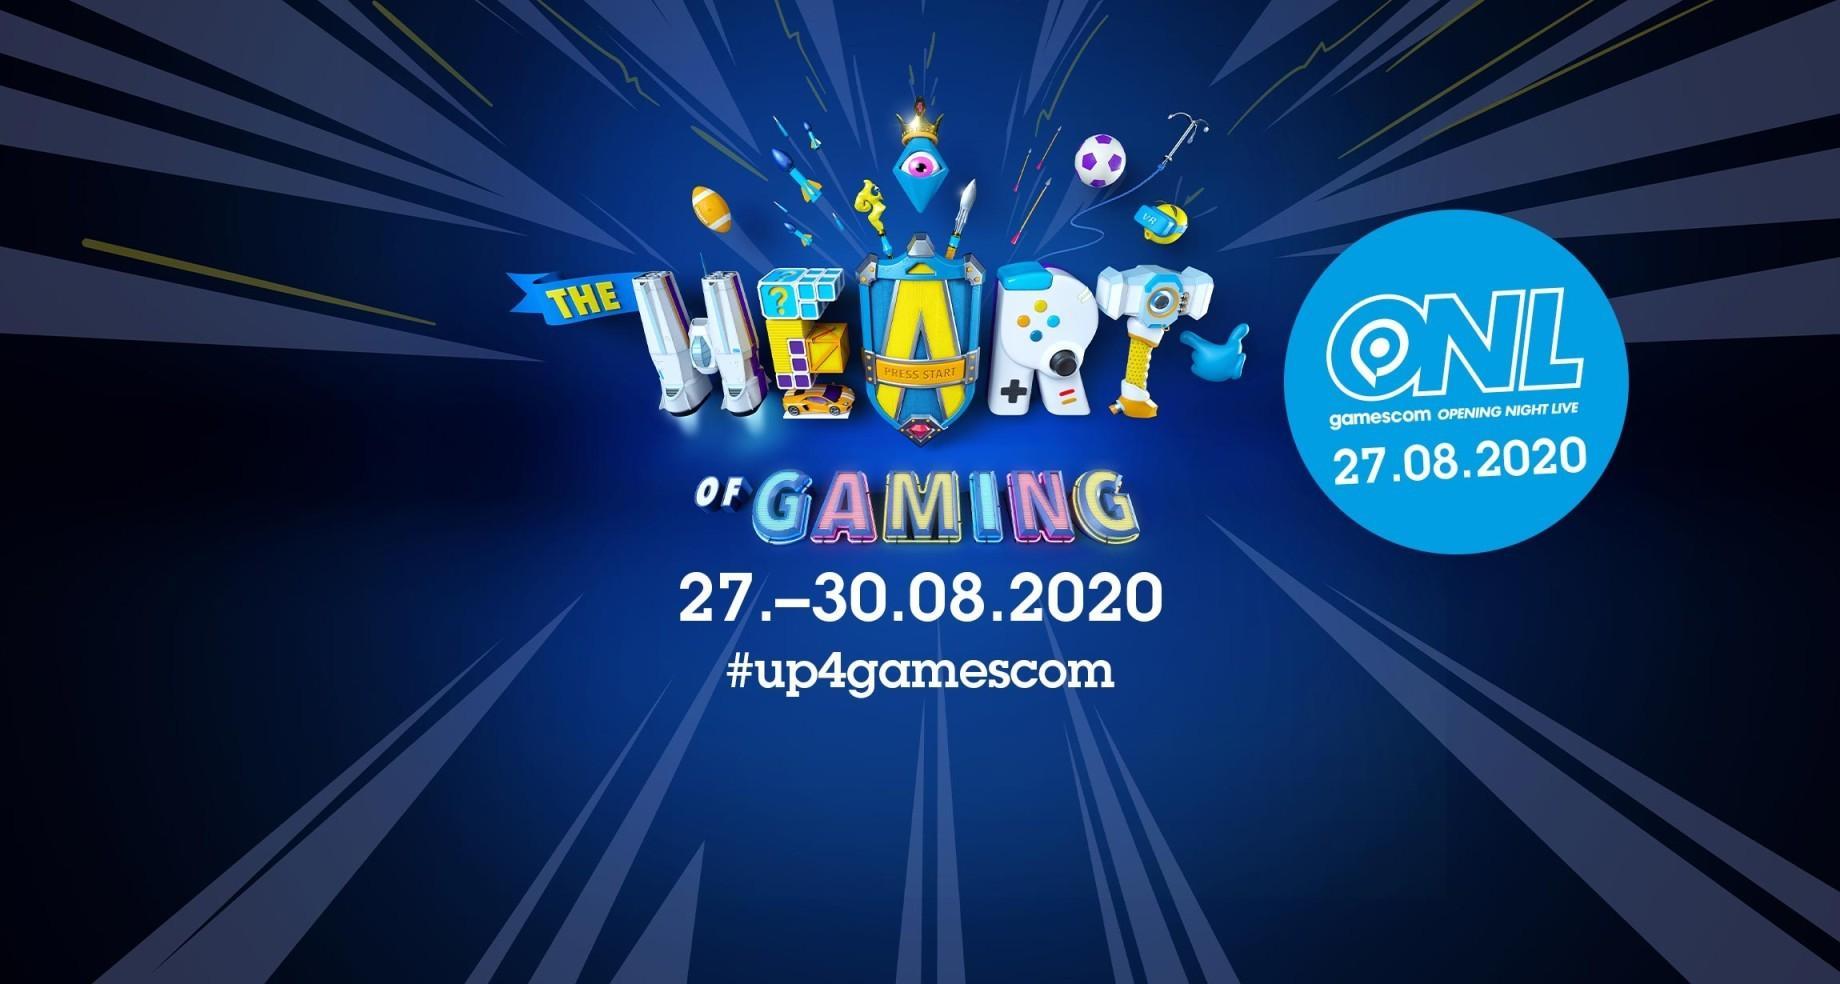 Дата проведения и подробности цифрового эвента Gamescom 2020 2